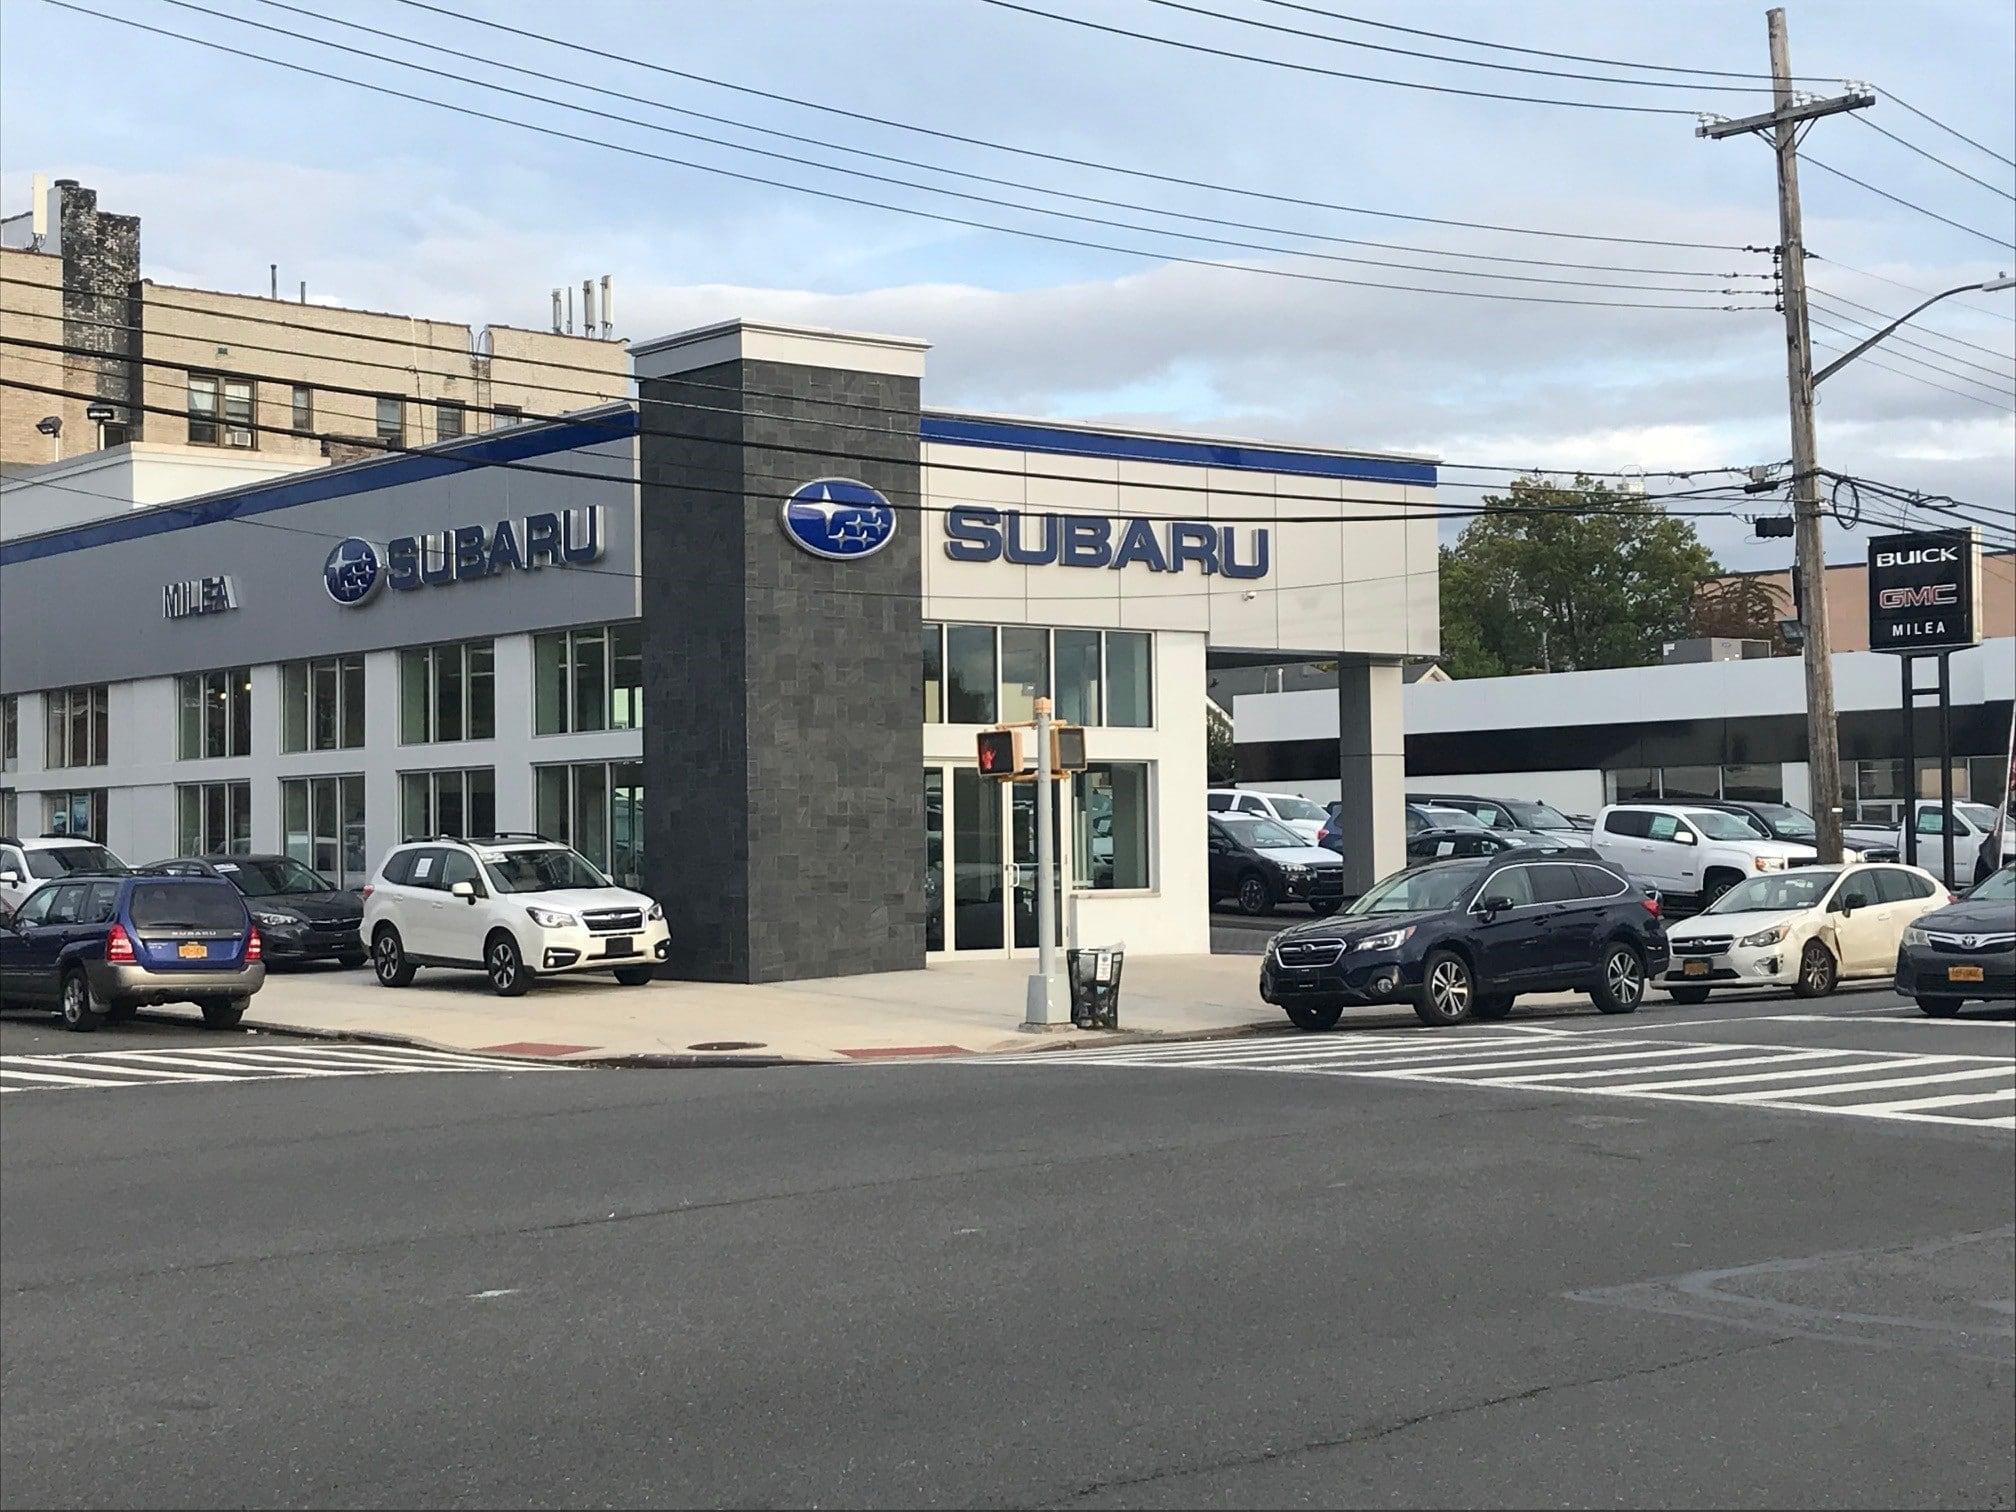 Milea Subaru New Subaru & Used Car Dealer Bronx NYC